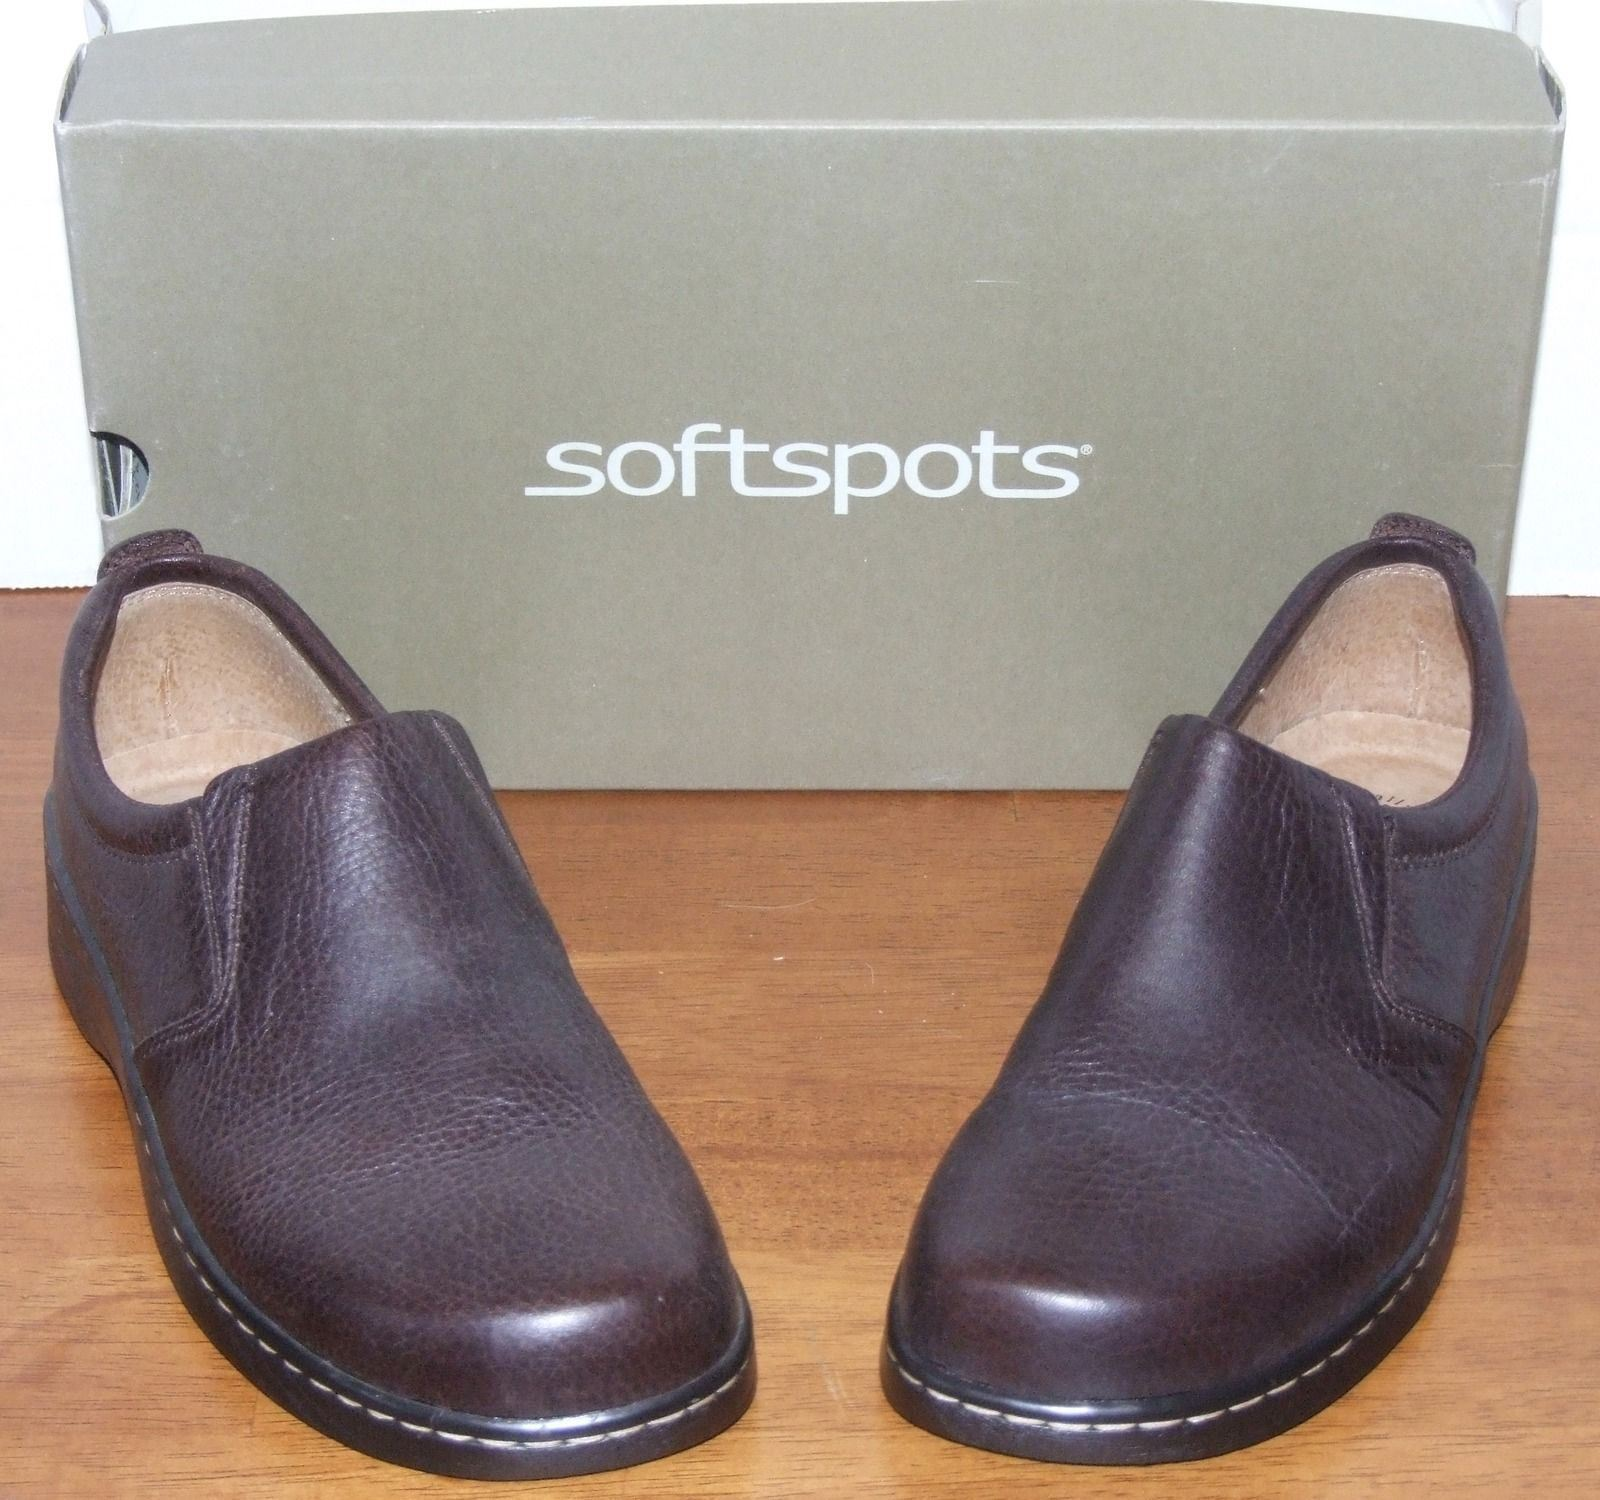 SOFTSPOTS Brewster Toffee chaussures En Cuir 7 1 2 M